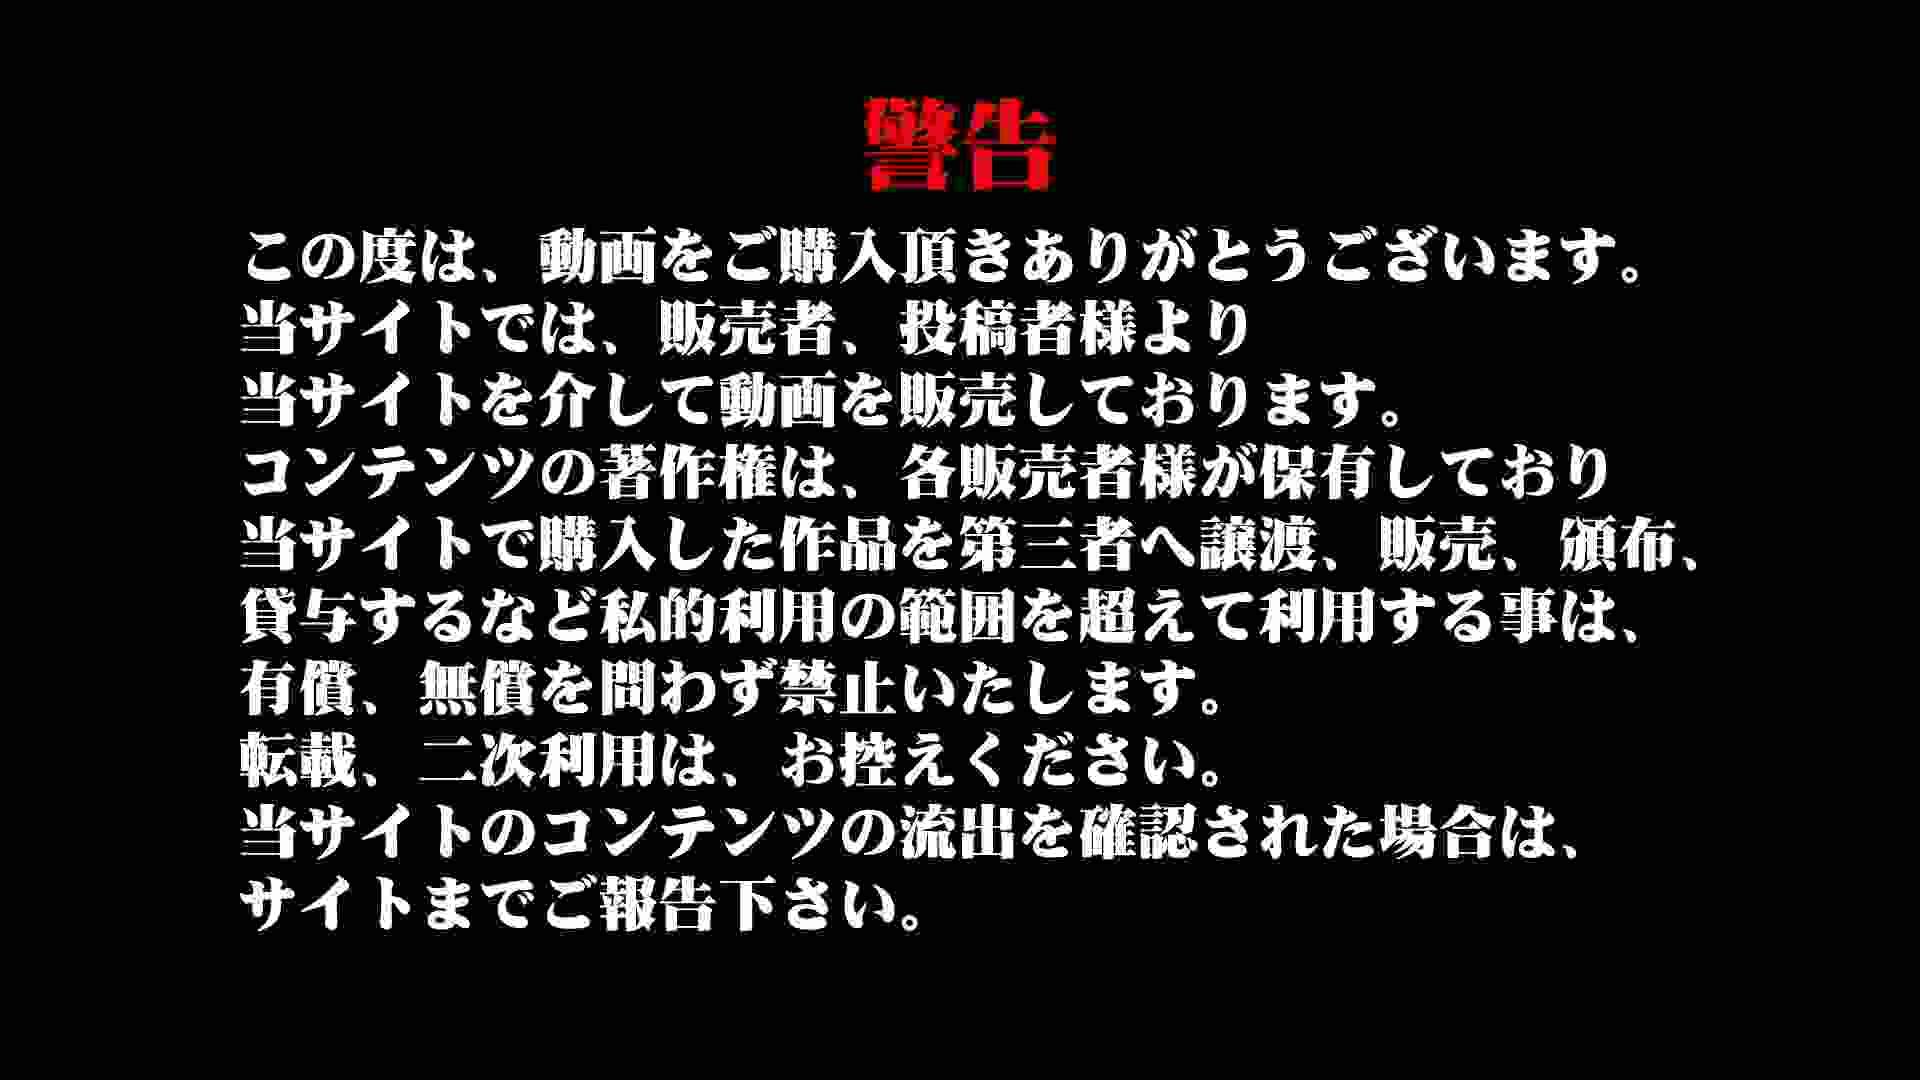 芸術大学ガチ潜入盗撮 JD盗撮 美女の洗面所の秘密 Vol.88 盛合せ 性交動画流出 83枚 4